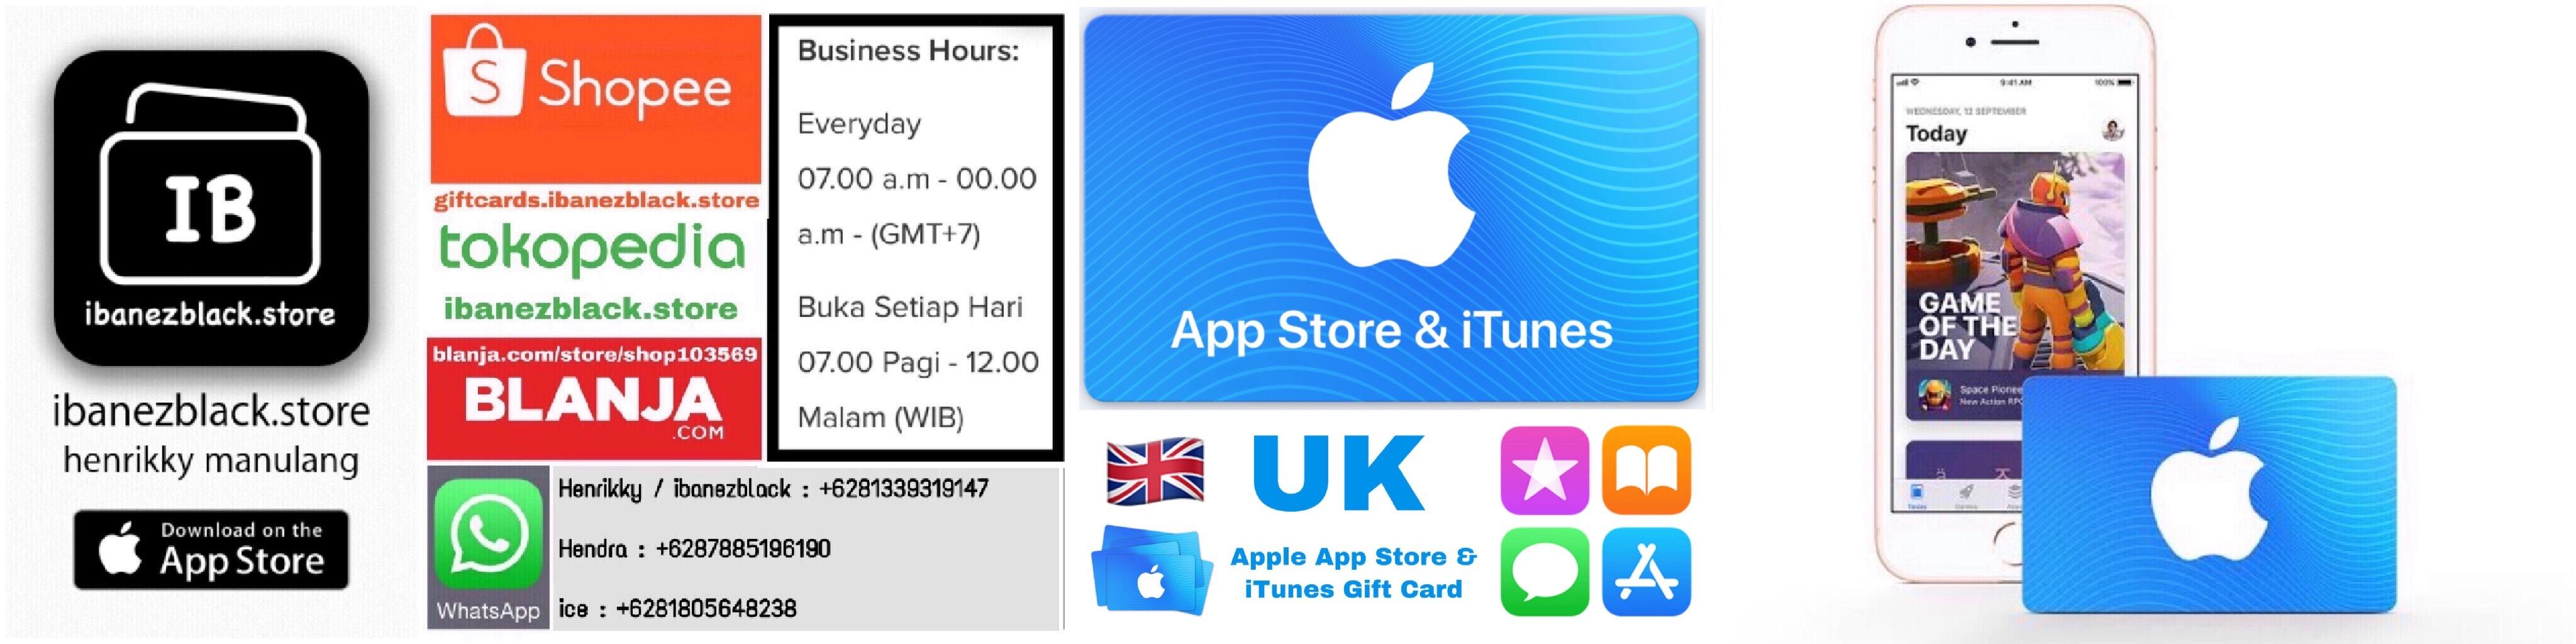 Apple App Store & iTunes Gift Card UK